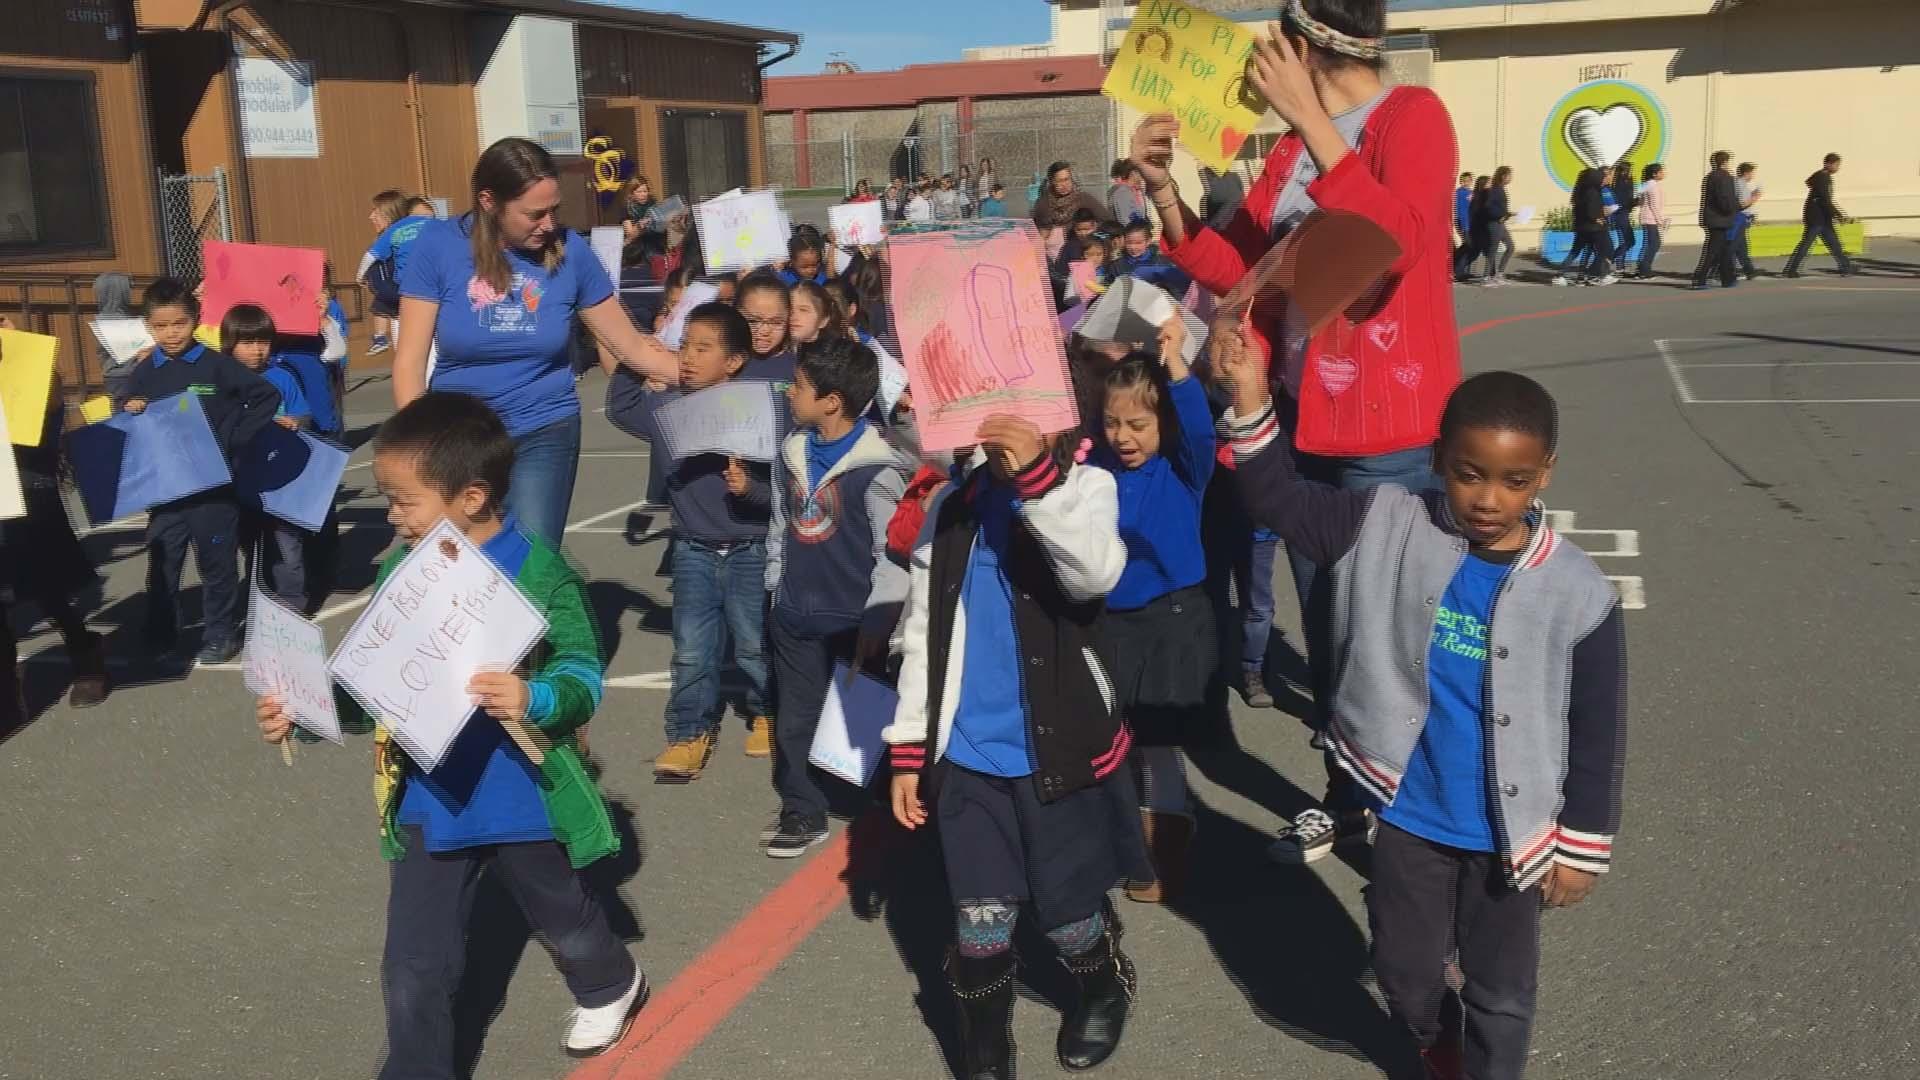 Childrens march_484999